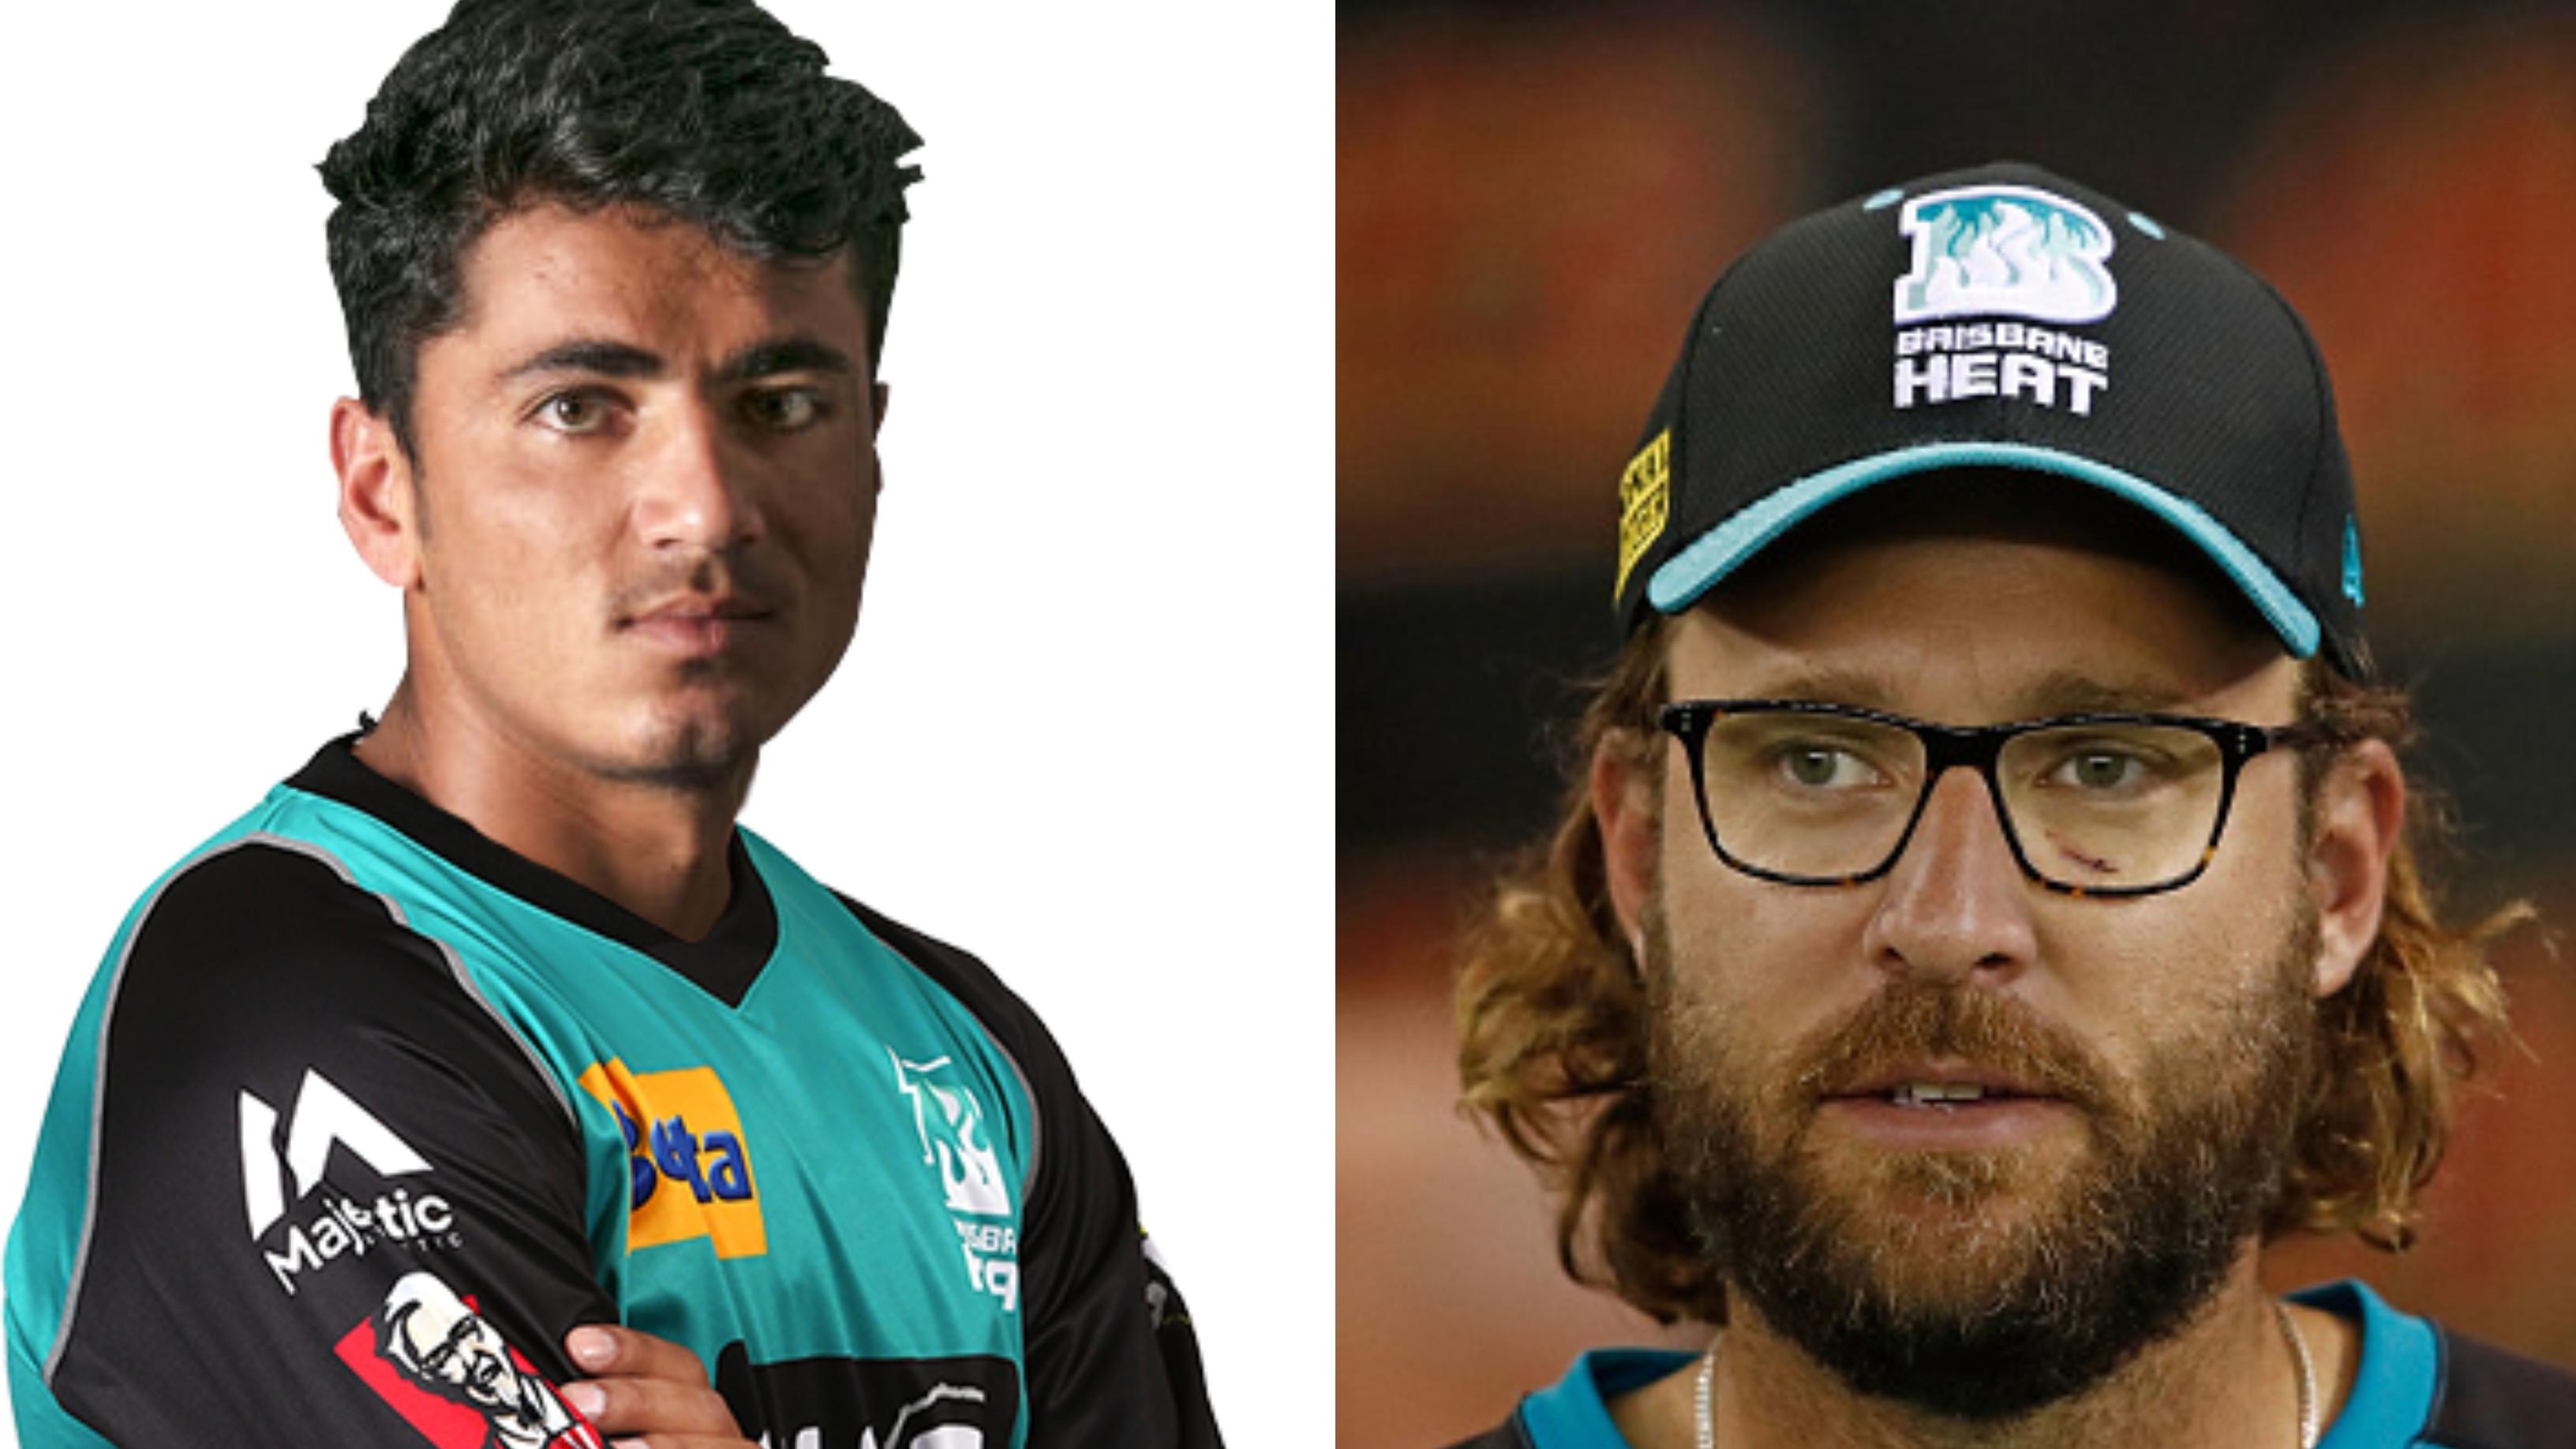 BBL 2018-19: Coach Daniel Vettori heaps praise on Mujeeb Ur Rahman ahead of his BBL debut